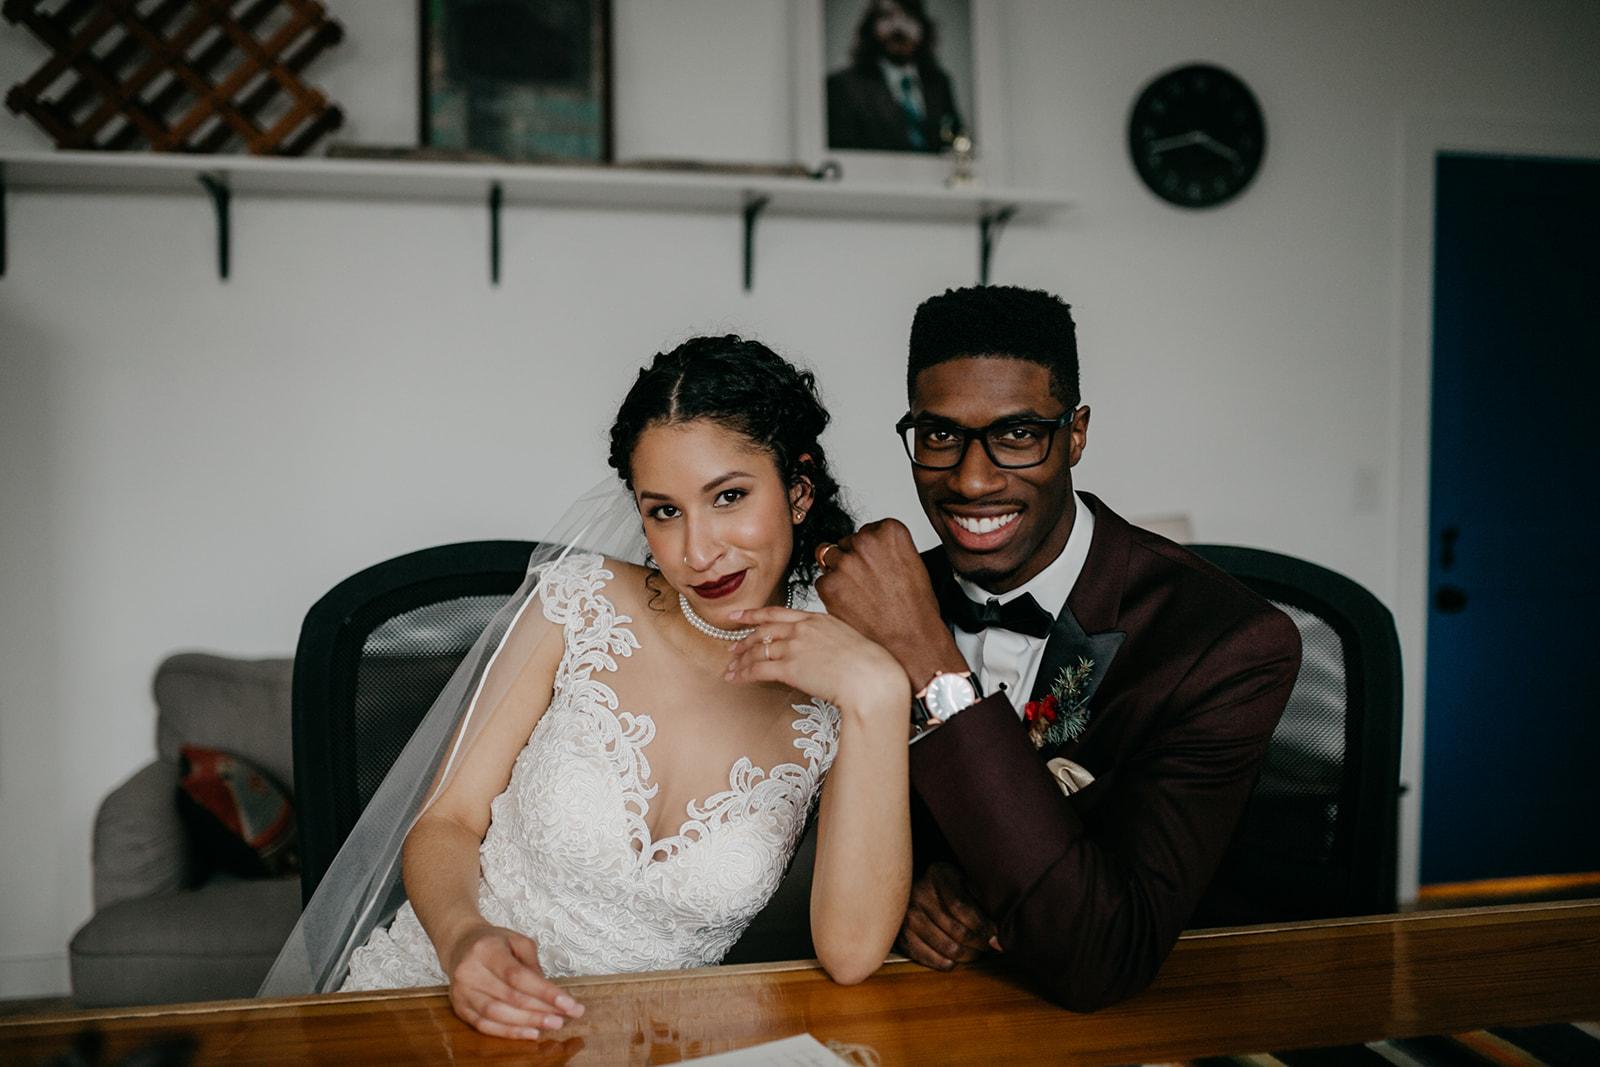 portland - wedding - photographer - doorofhopechurch515.jpg